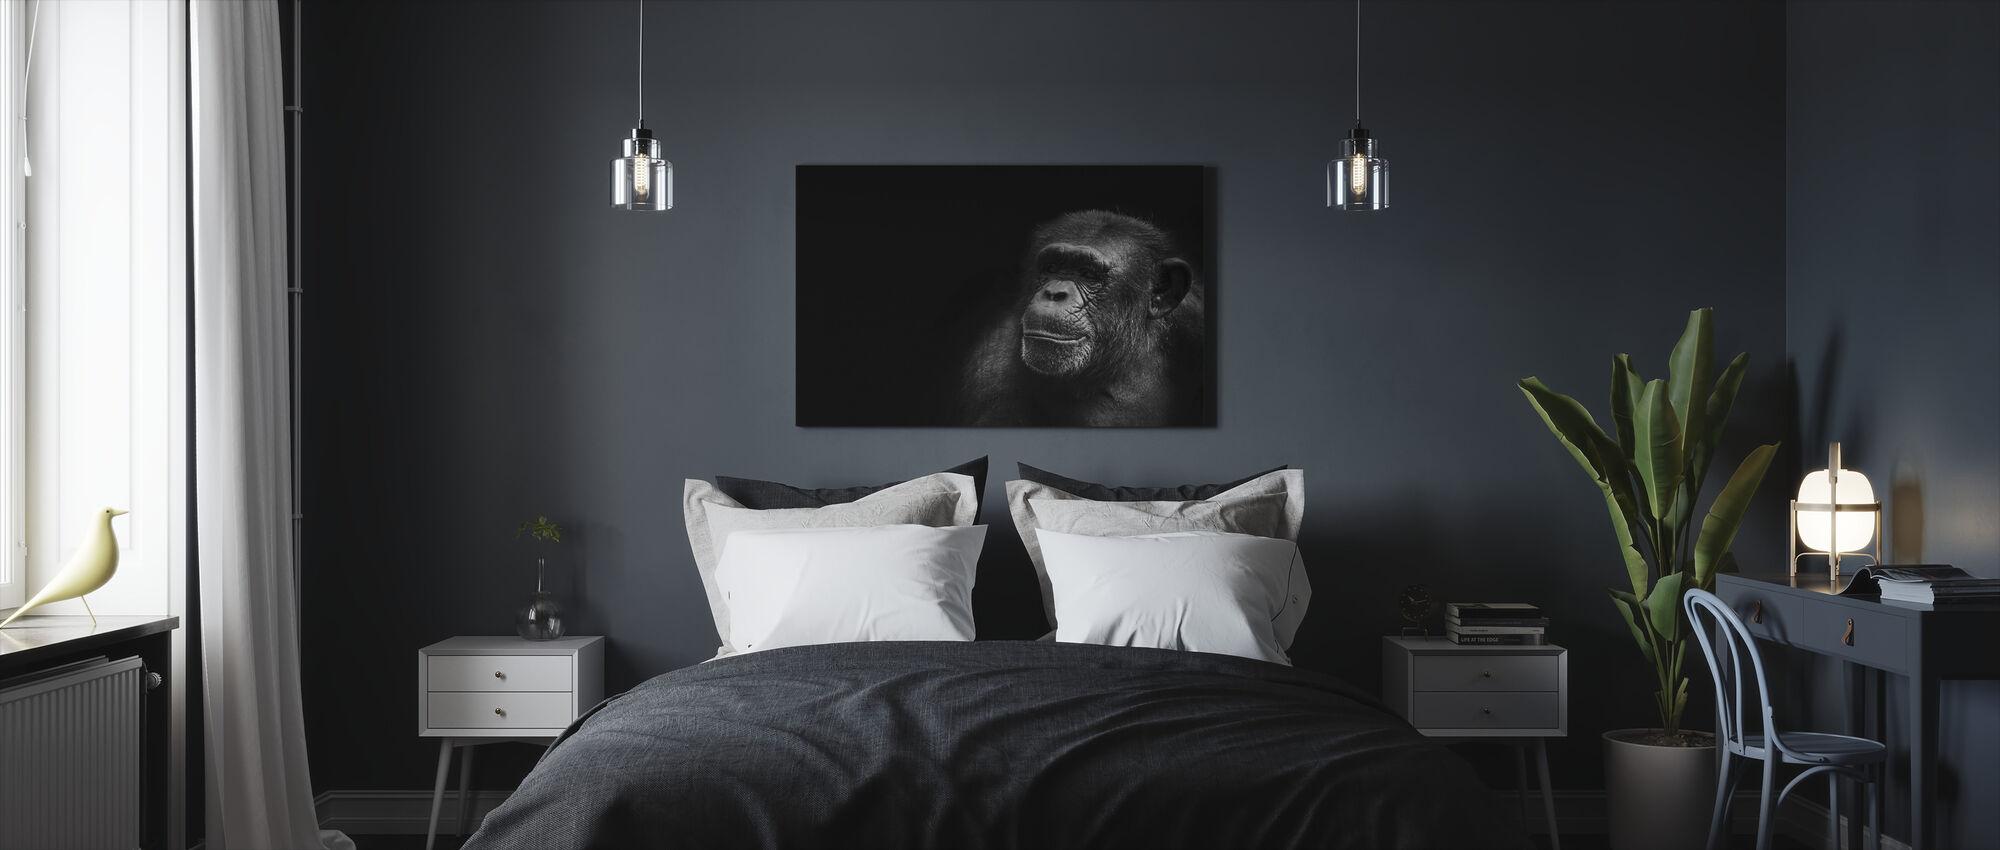 Apa och svart - Canvastavla - Sovrum